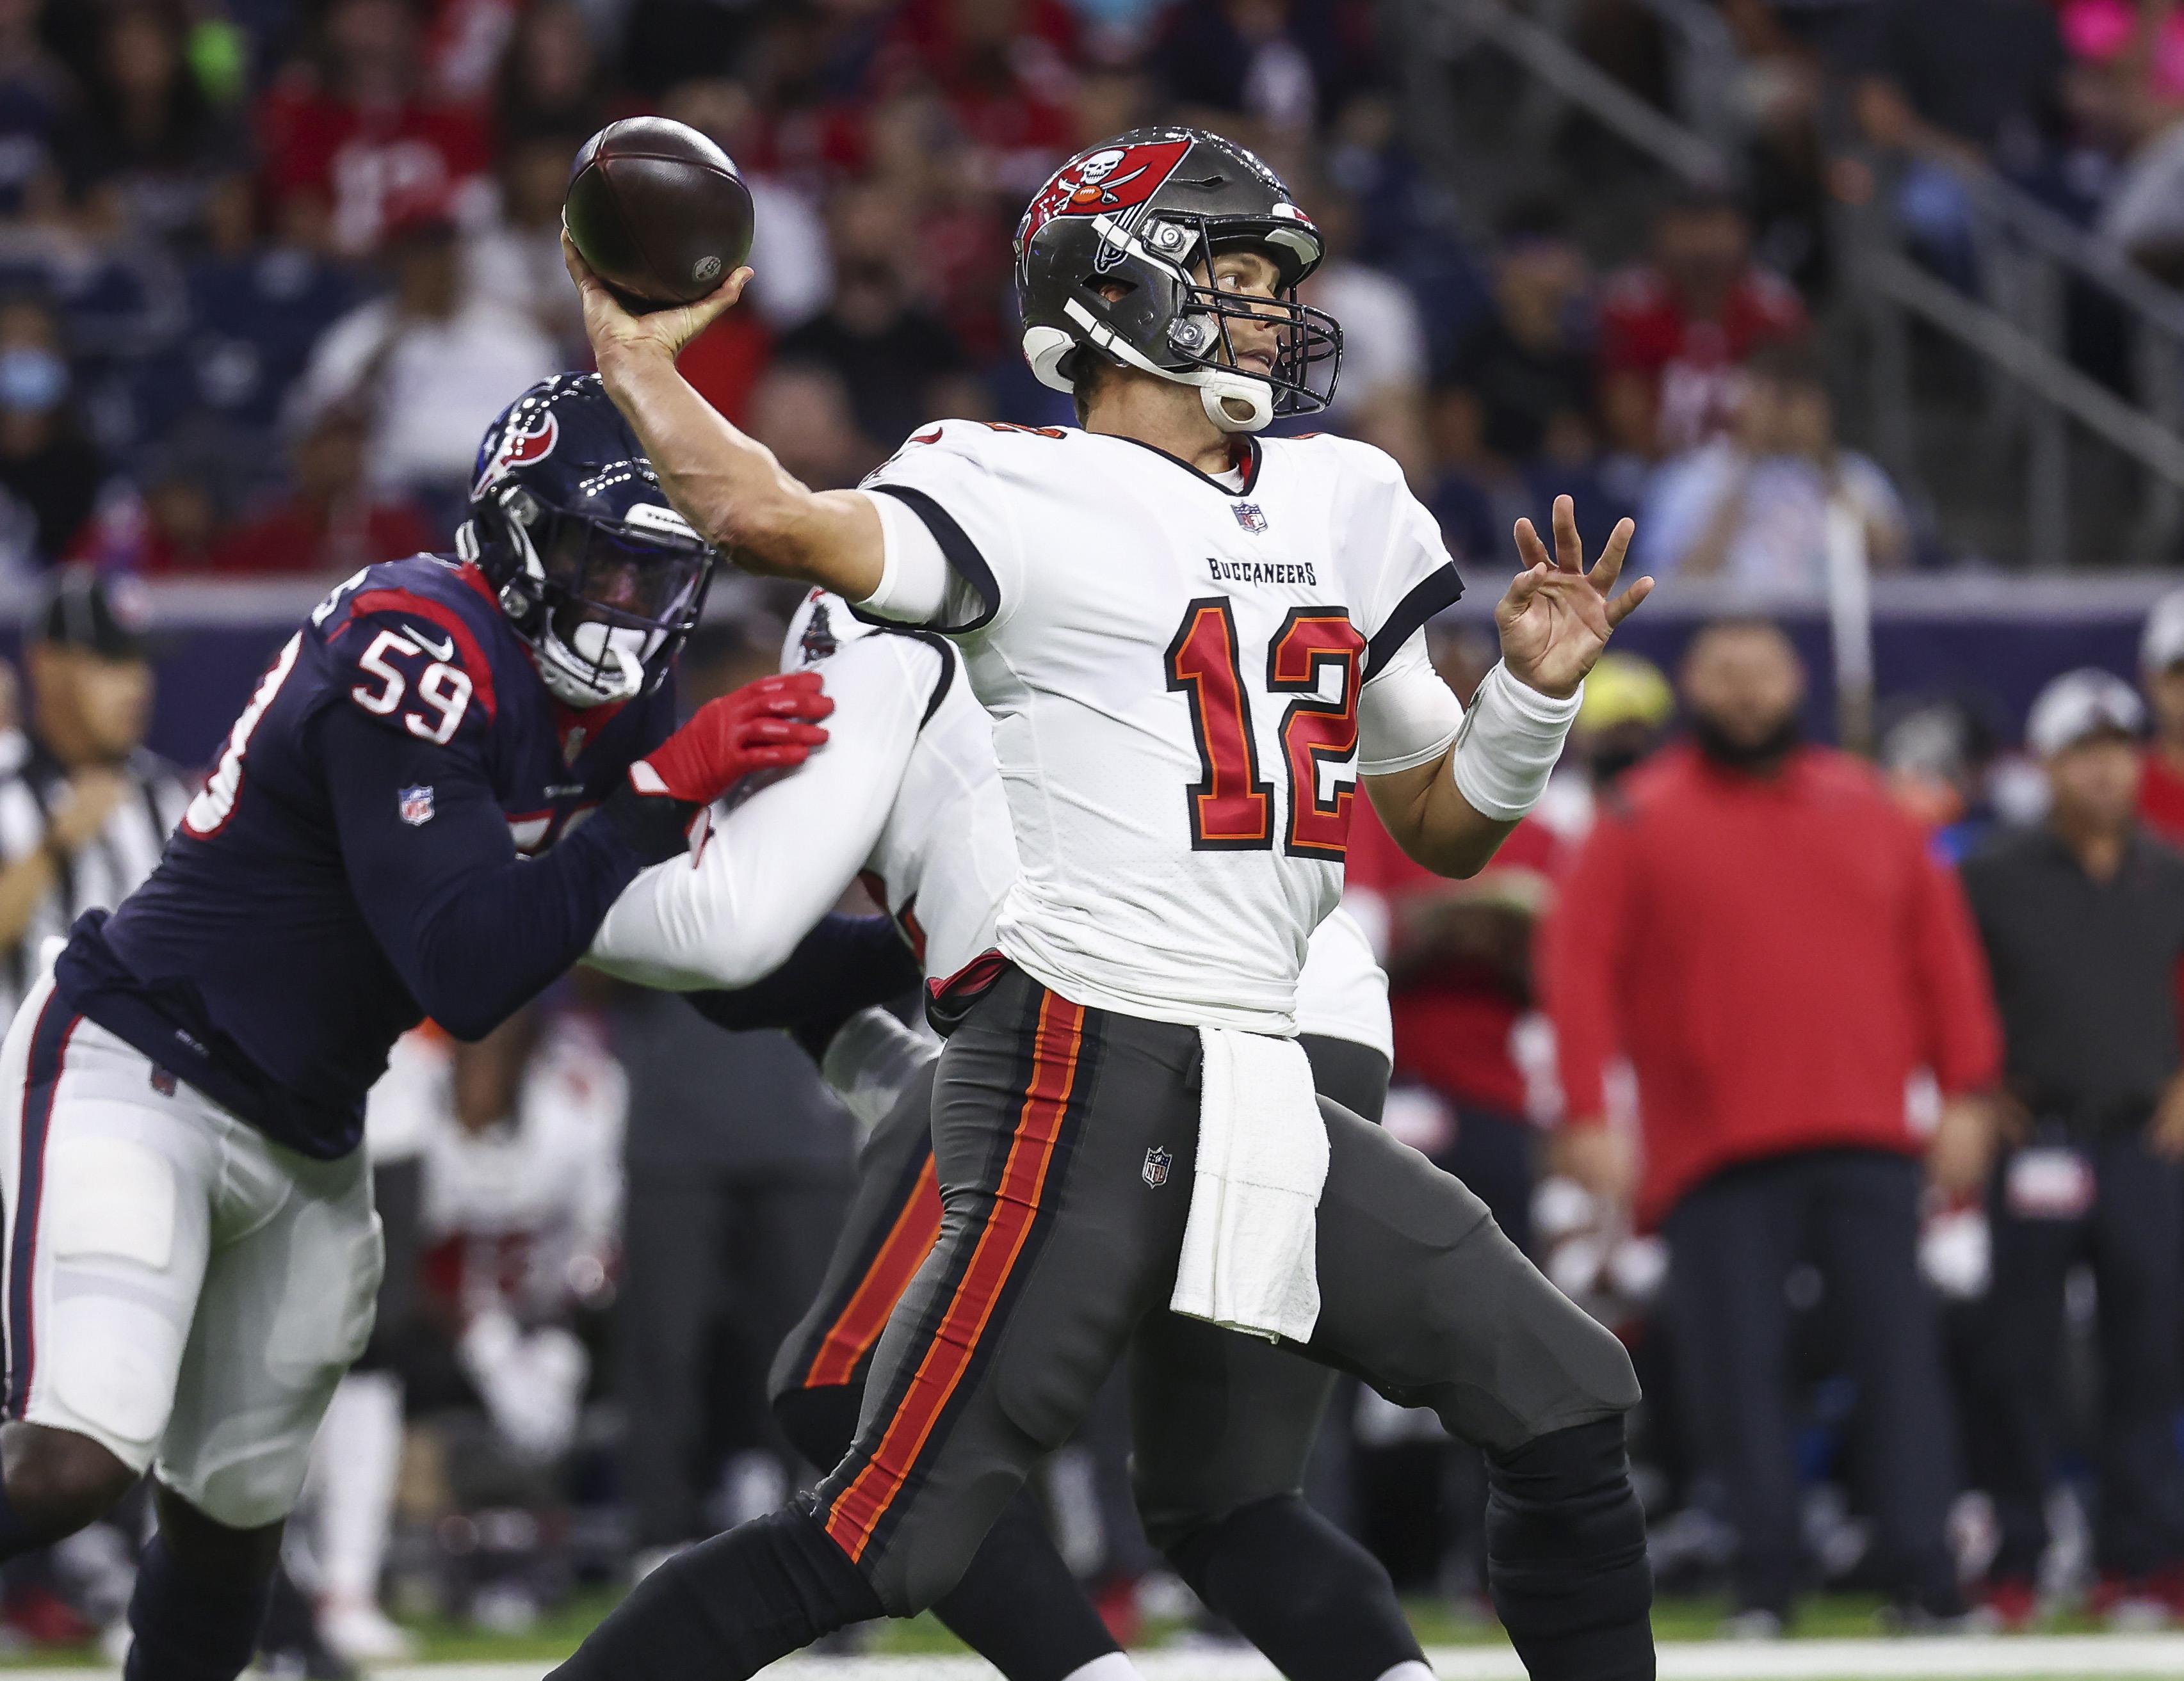 NFL: Tampa Bay Buccaneers at Houston Texans